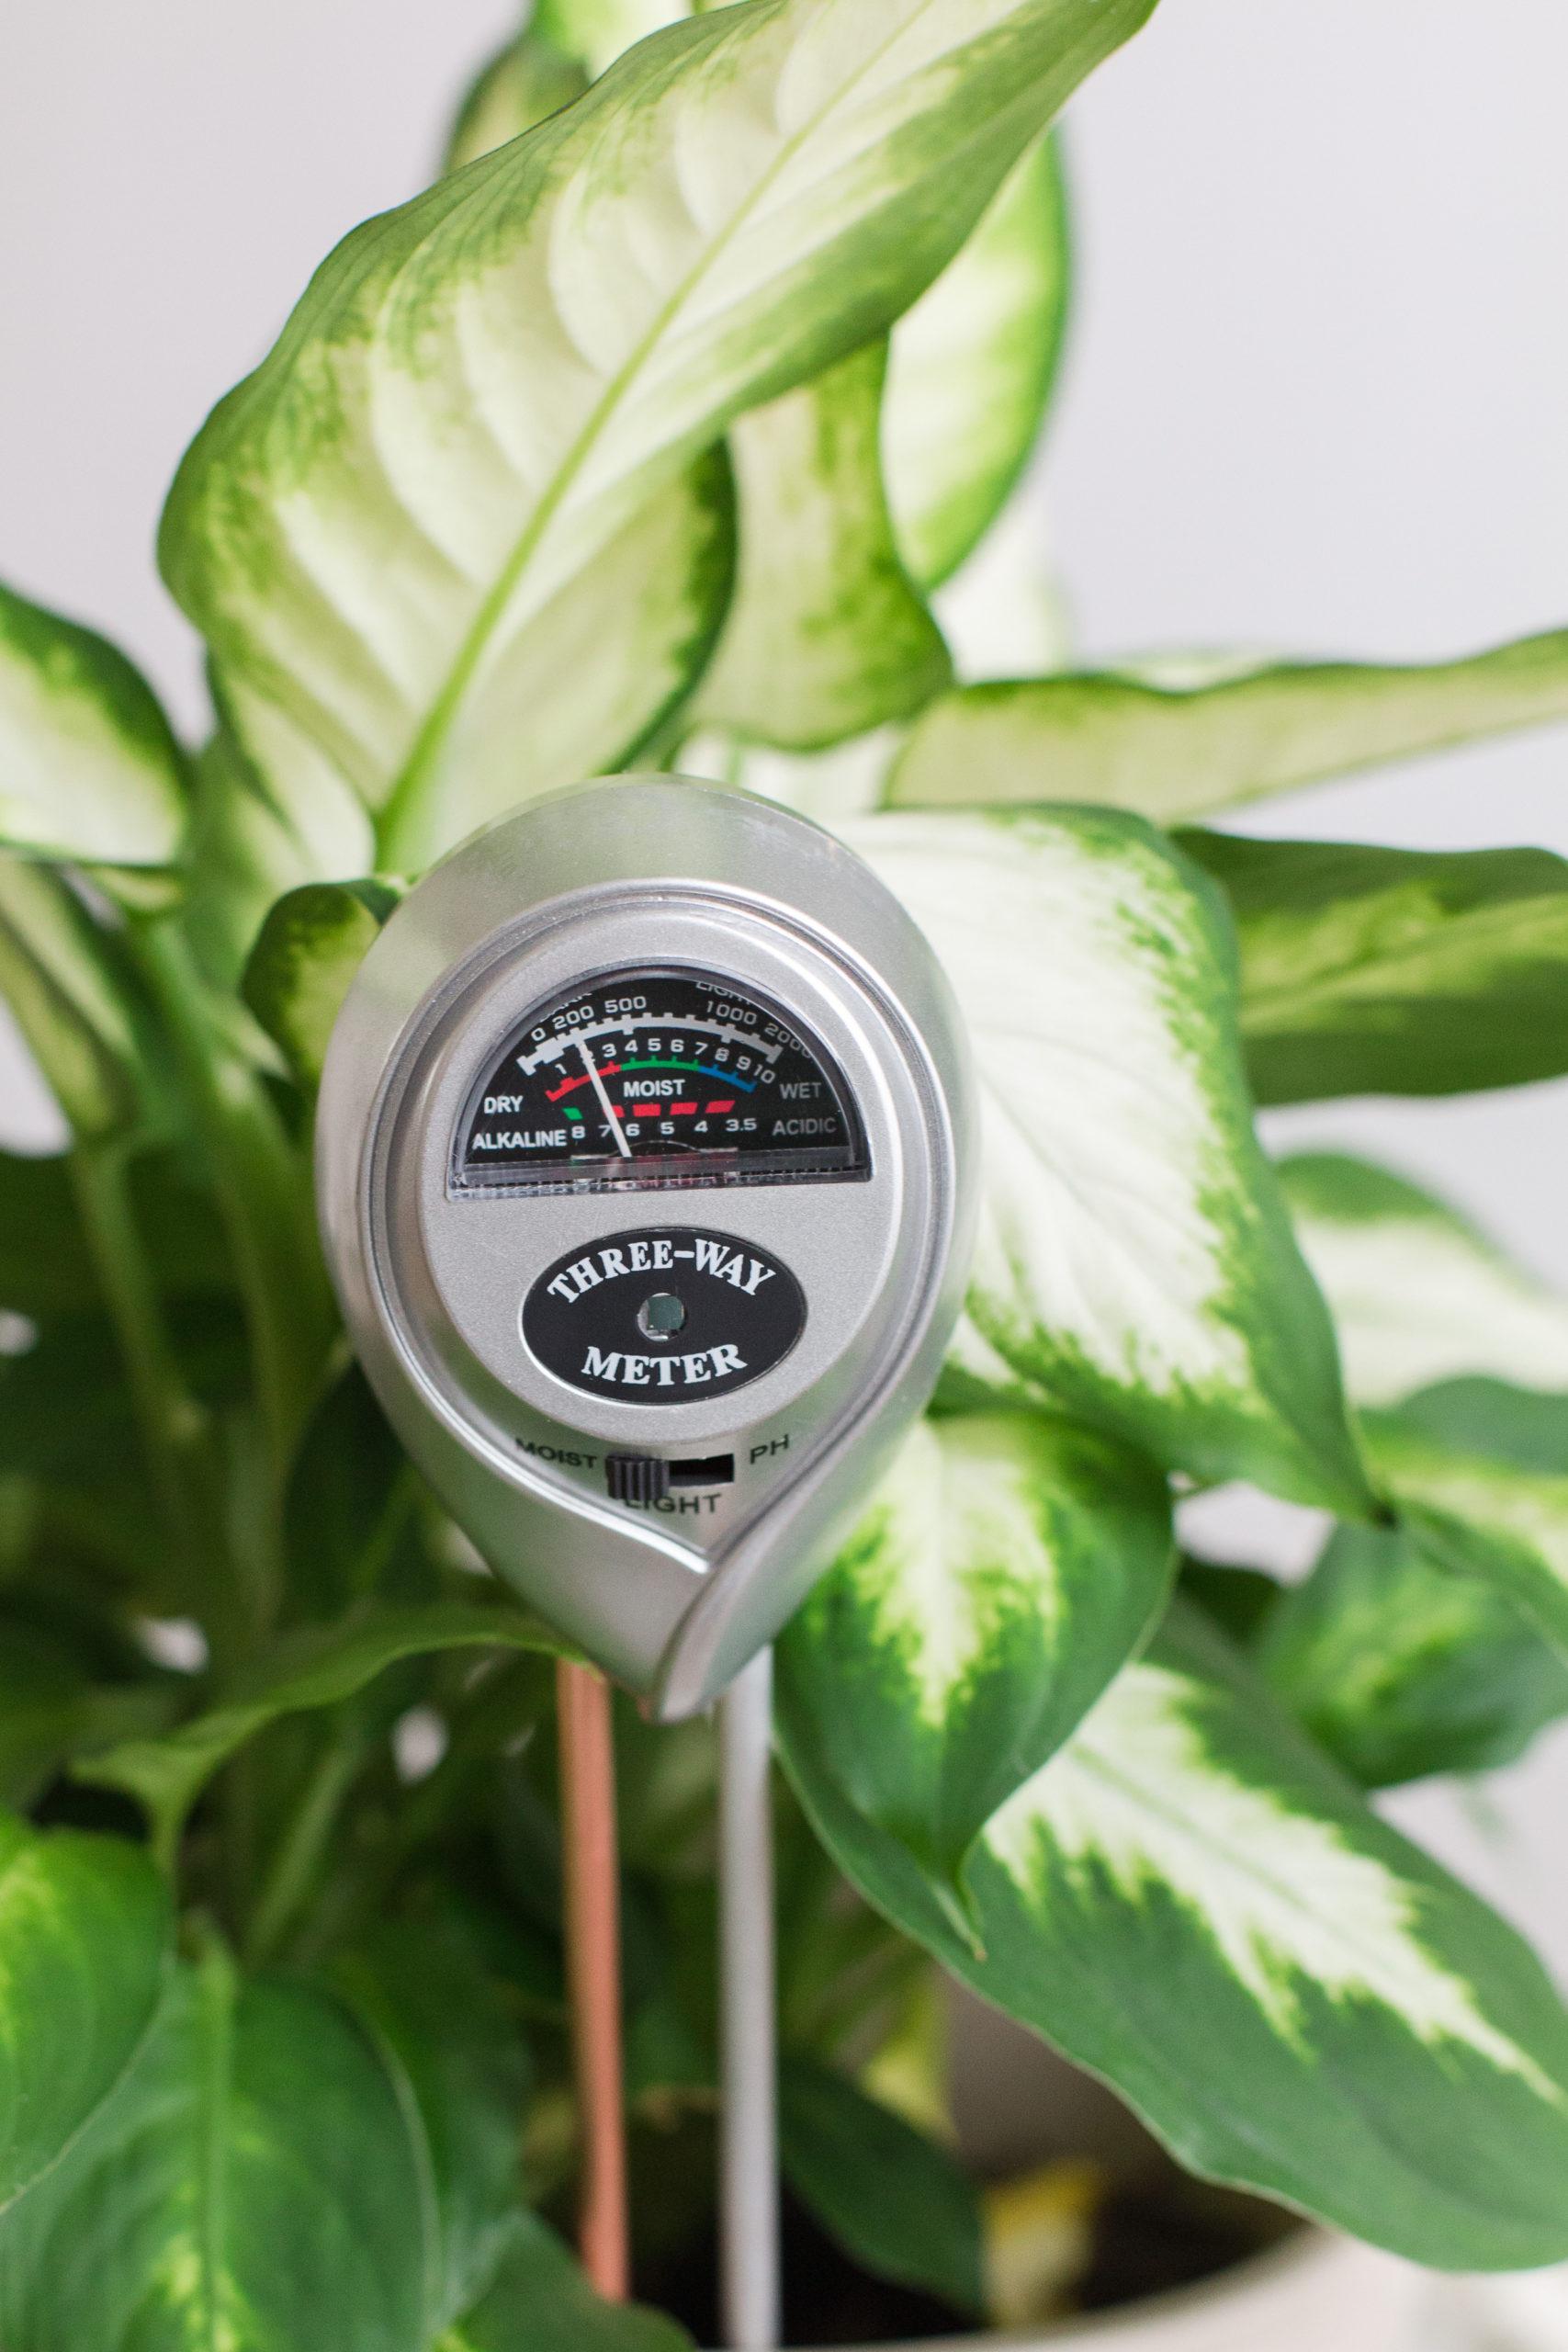 Houseplant 3-1 Moisture Meter